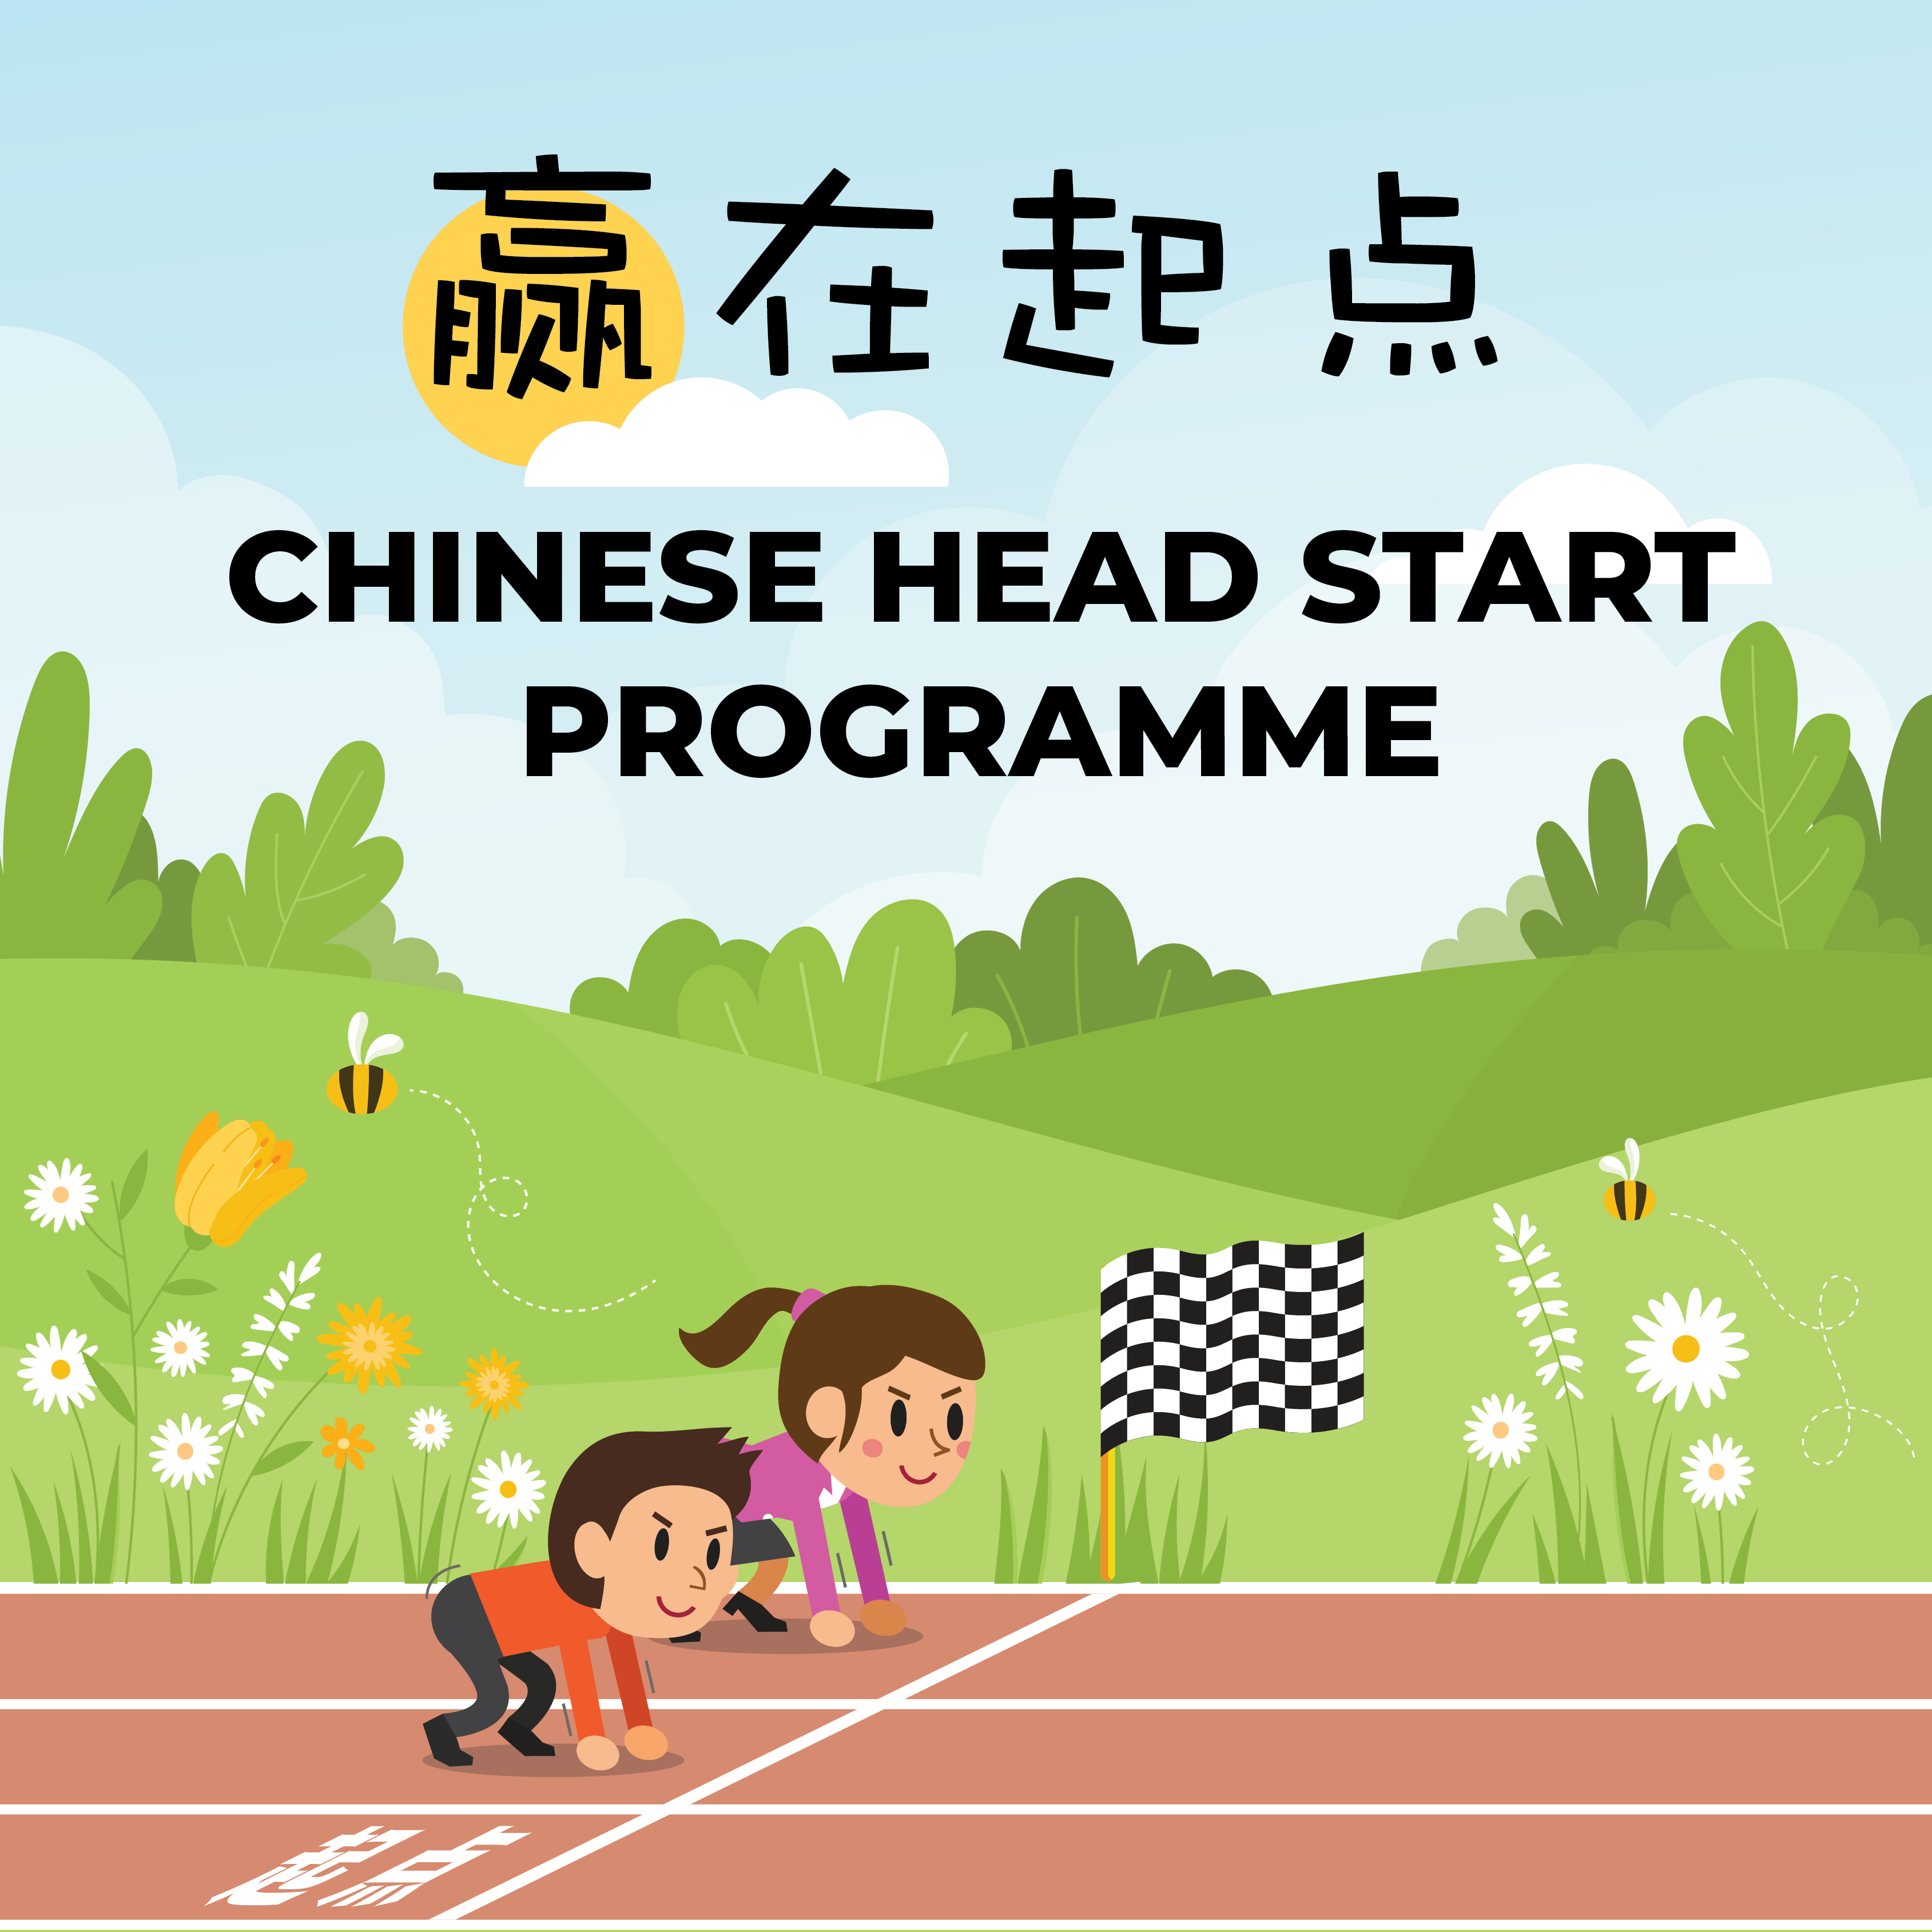 Dec 2020 Chinese Head Start Programme